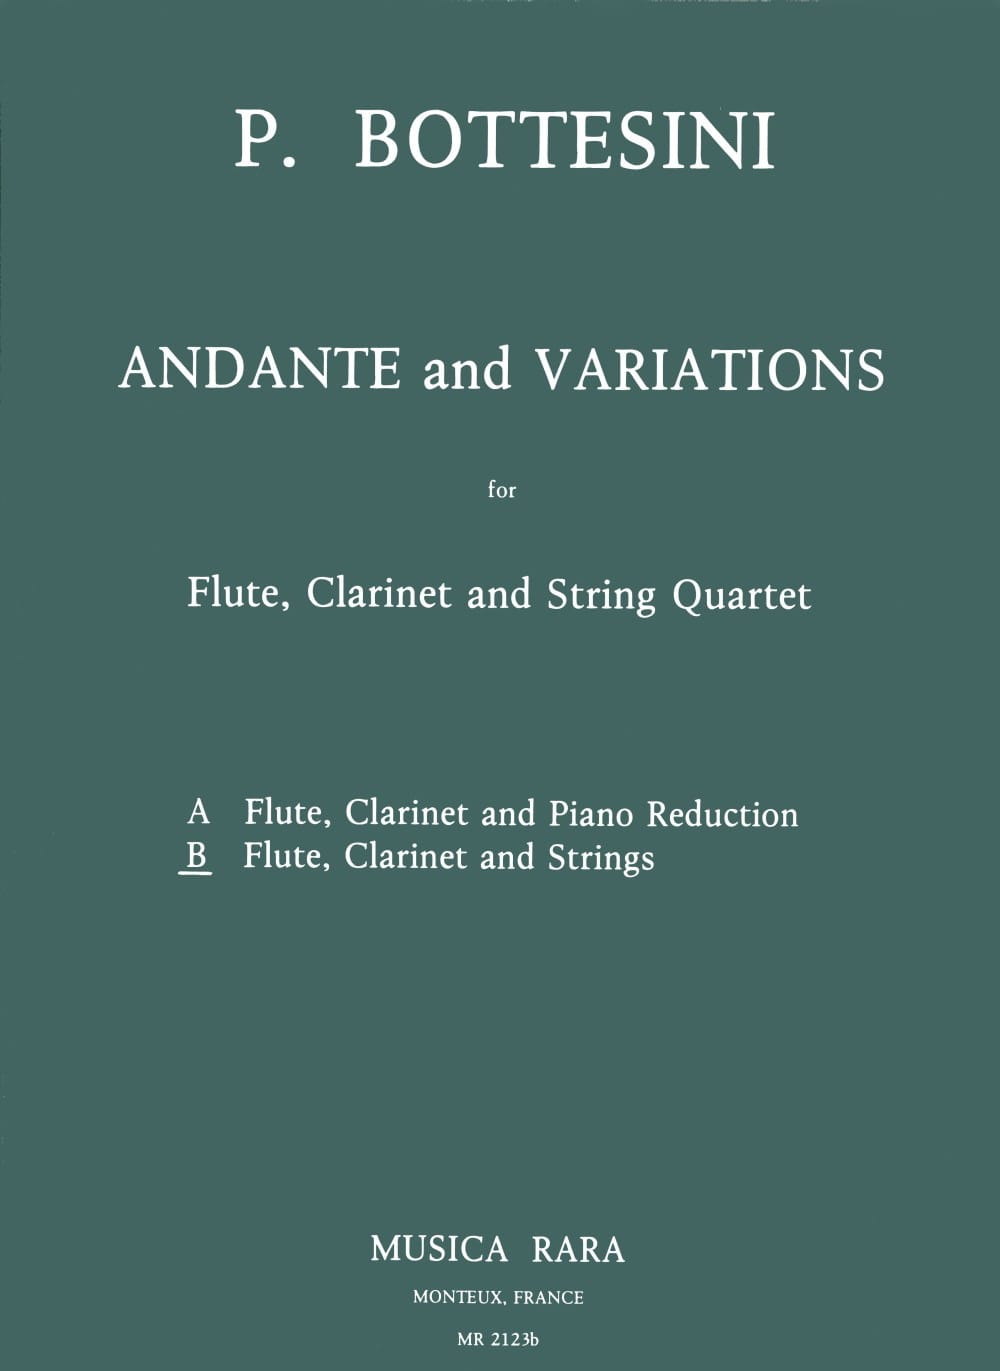 Andante and Variations - Flute clarinet string quartet - Score + Parts - laflutedepan.com